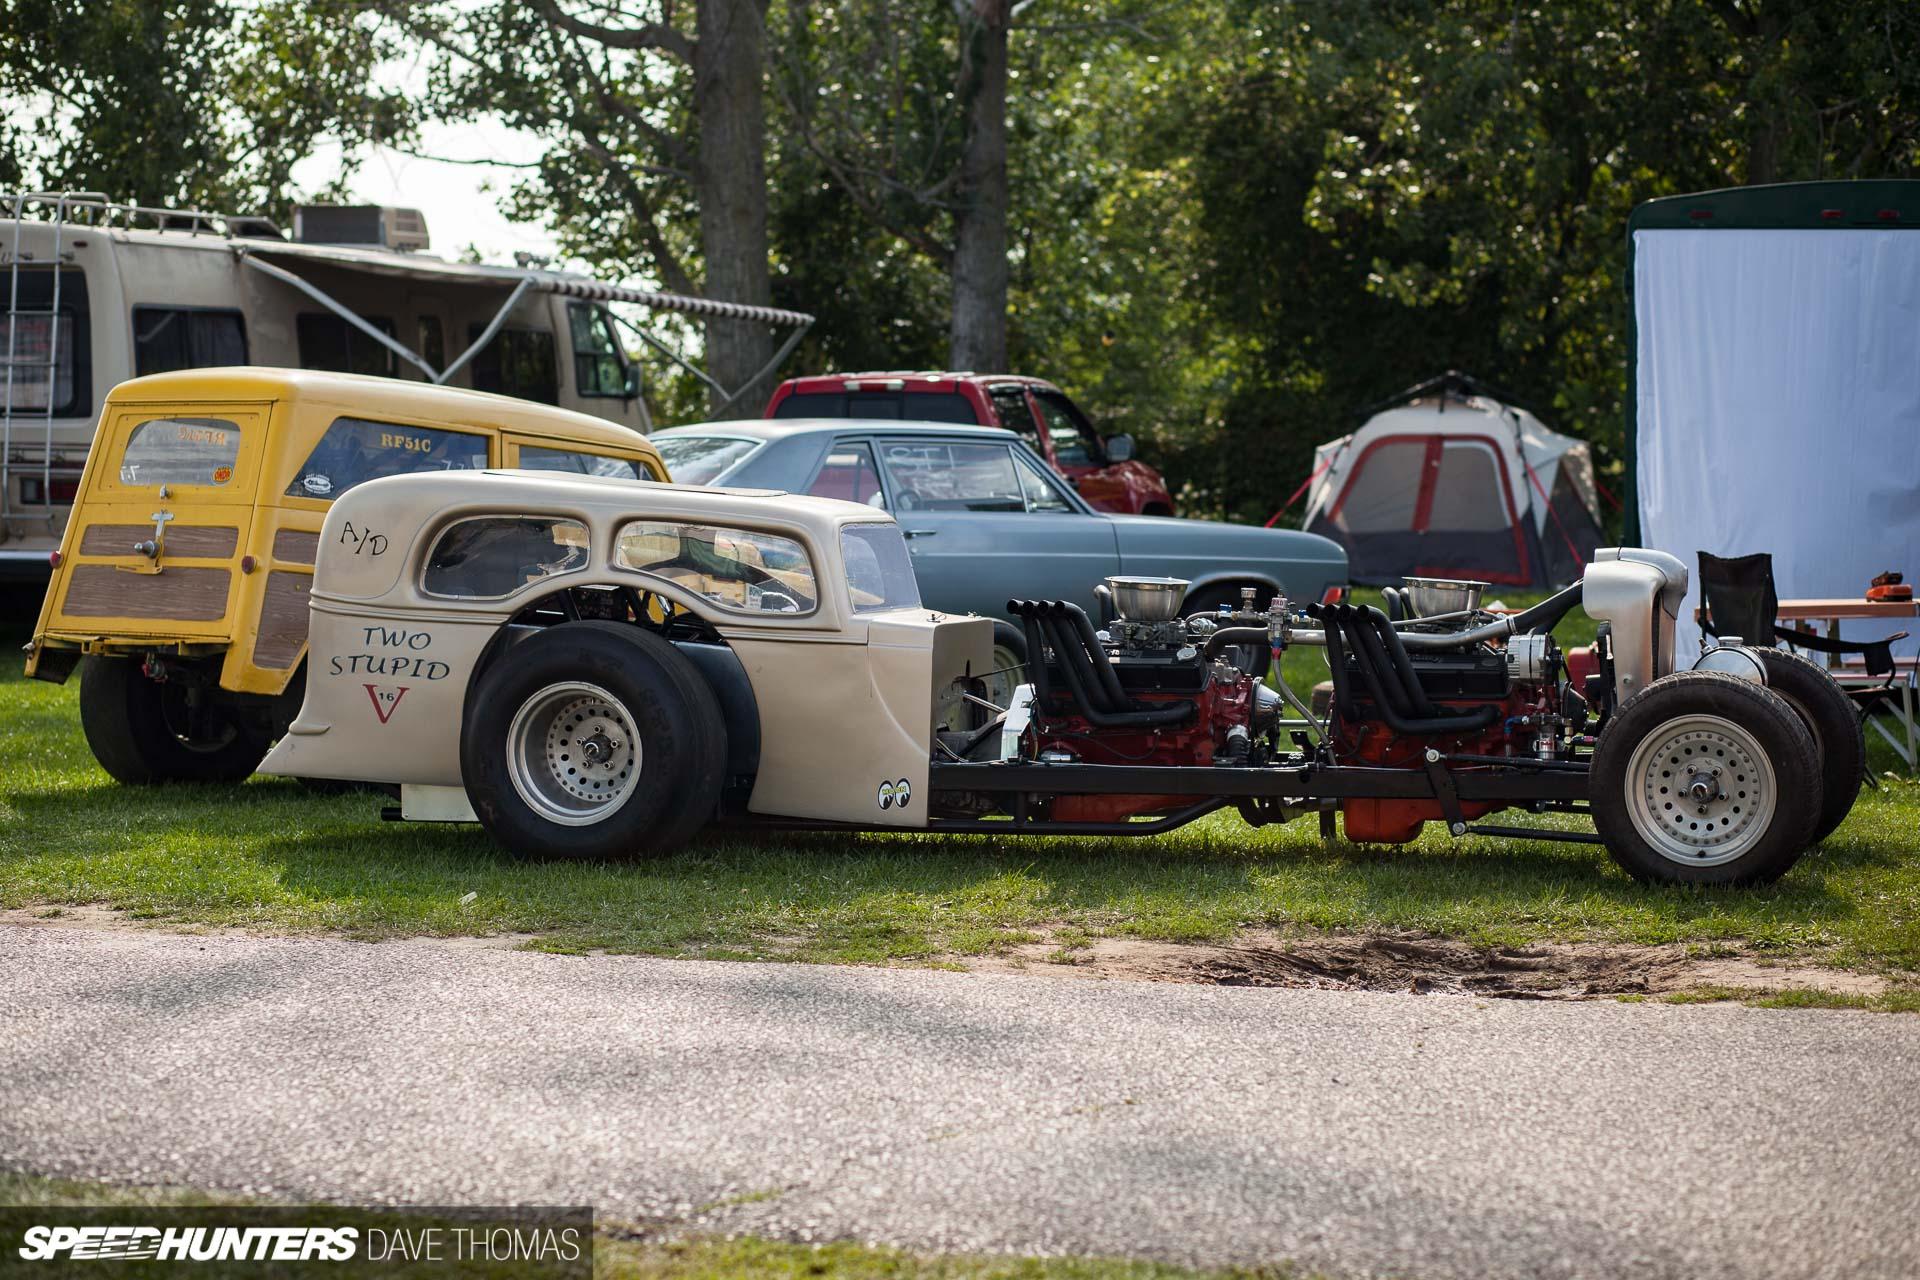 Cheap Fun Two Cars Three V8s Speedhunters